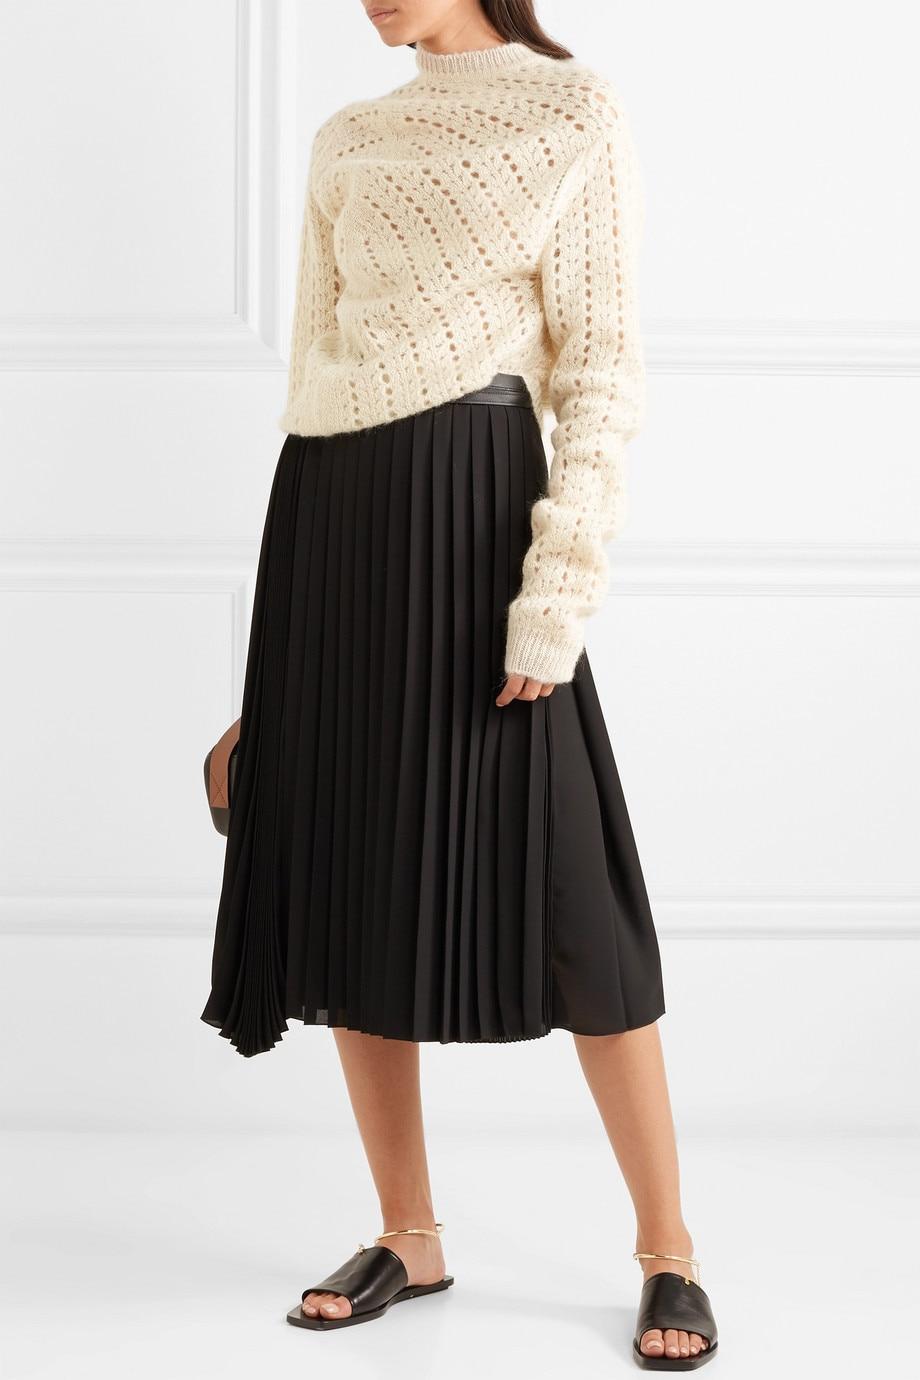 Pull Irrégulière 2018 Hiver Chandail Femme Blanc Streetwear Mode Évider Femmes Whitney Ww Jumper Wang Automne 1961 avFn5q0